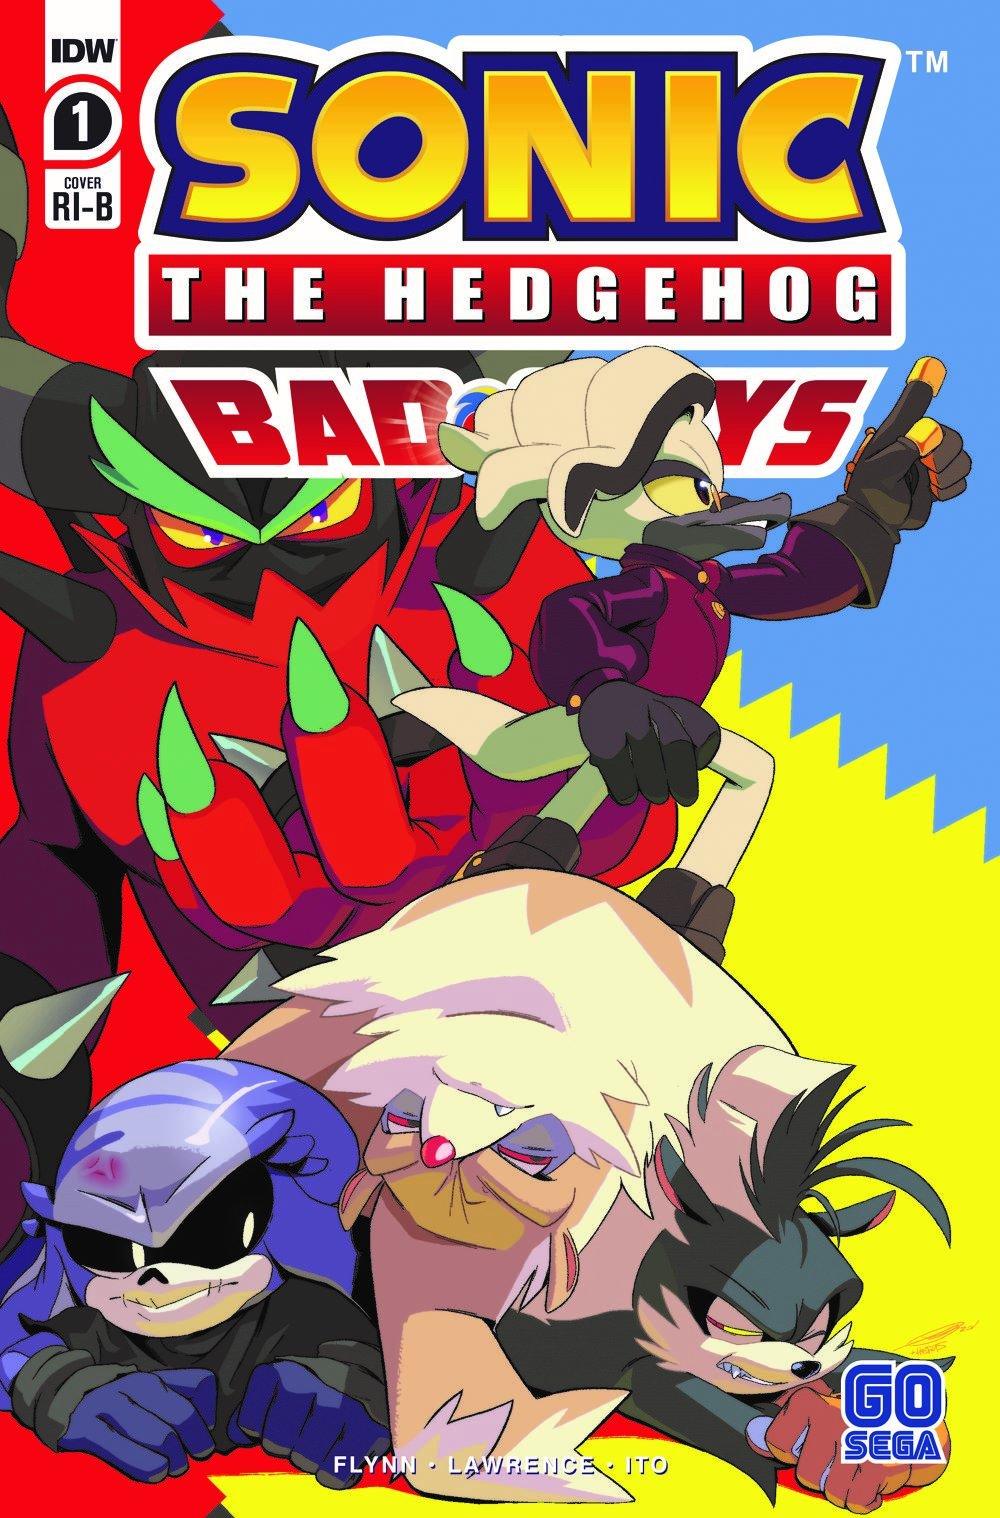 Sonic The Hedgehog: Bad Guys #1 RI-B